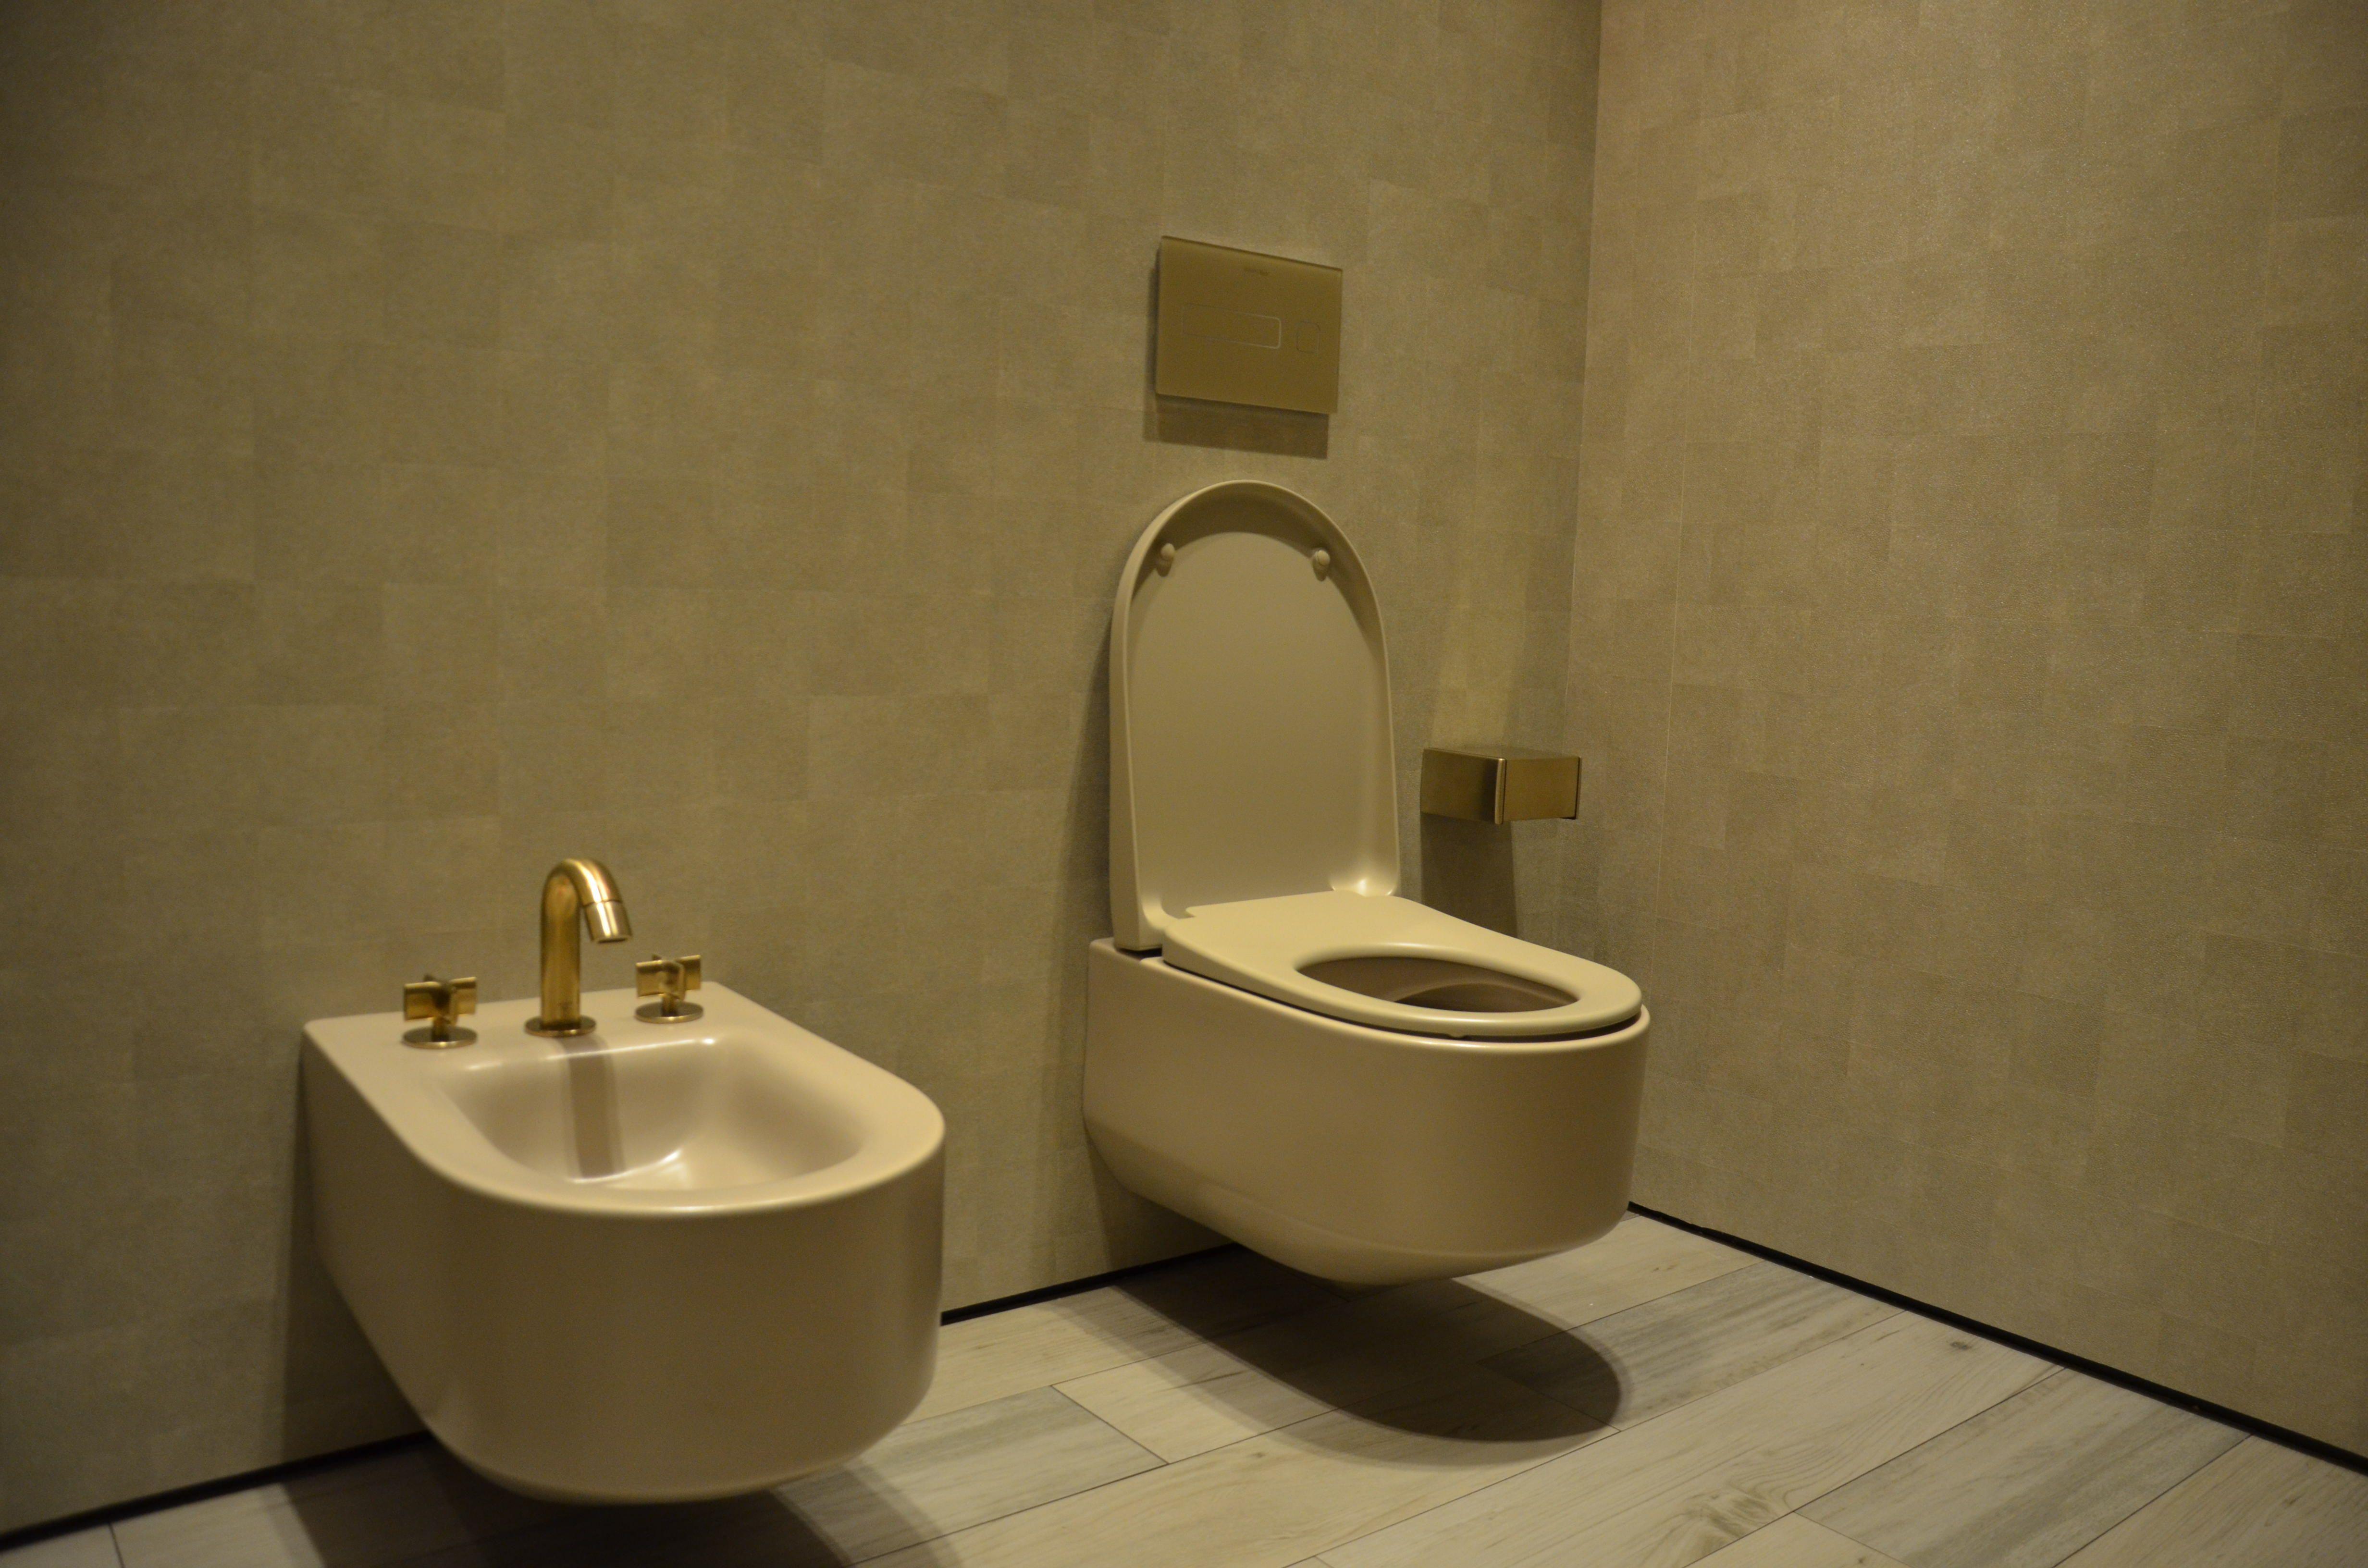 Vasca Da Bagno Roca Prezzi : Miscelatore per vasca con doccetta thesis miscelatore per vasca